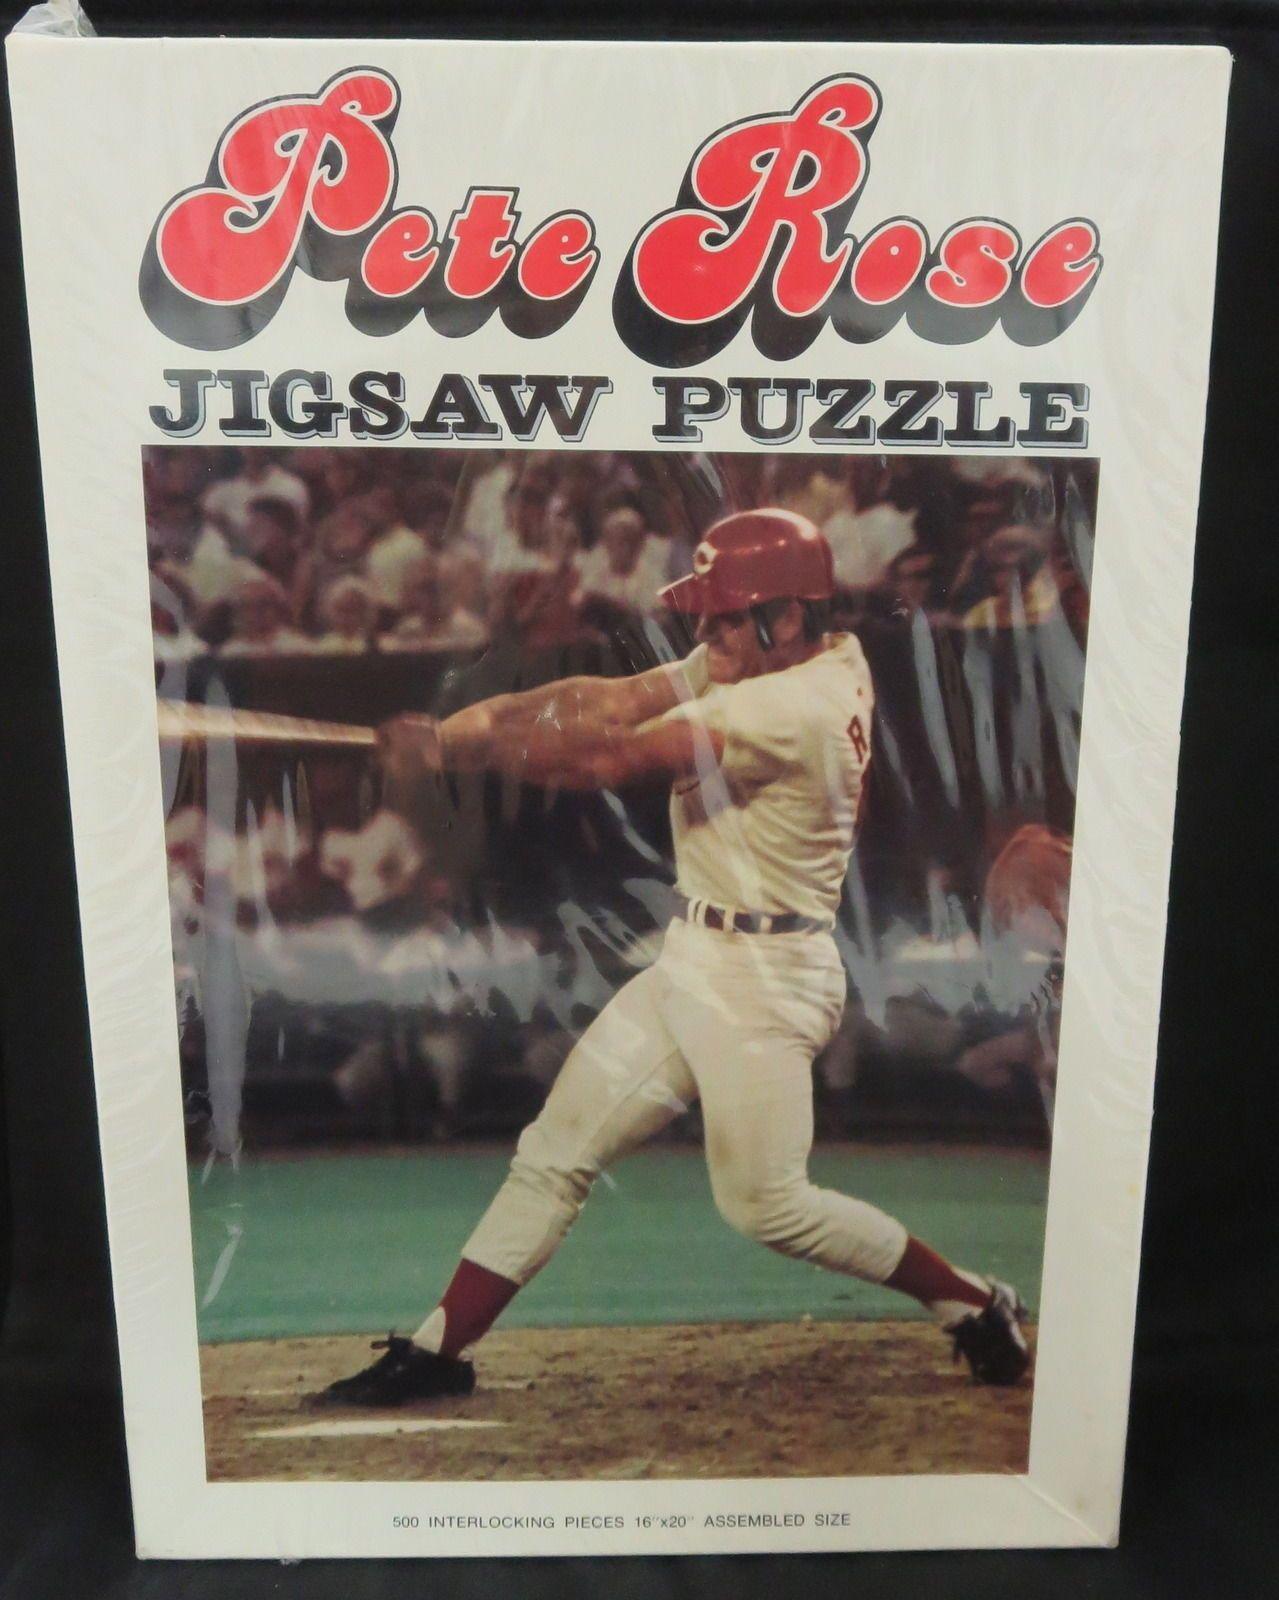 Pete Rose 1972 Jigsaw Puzzle Still in Original Packaging